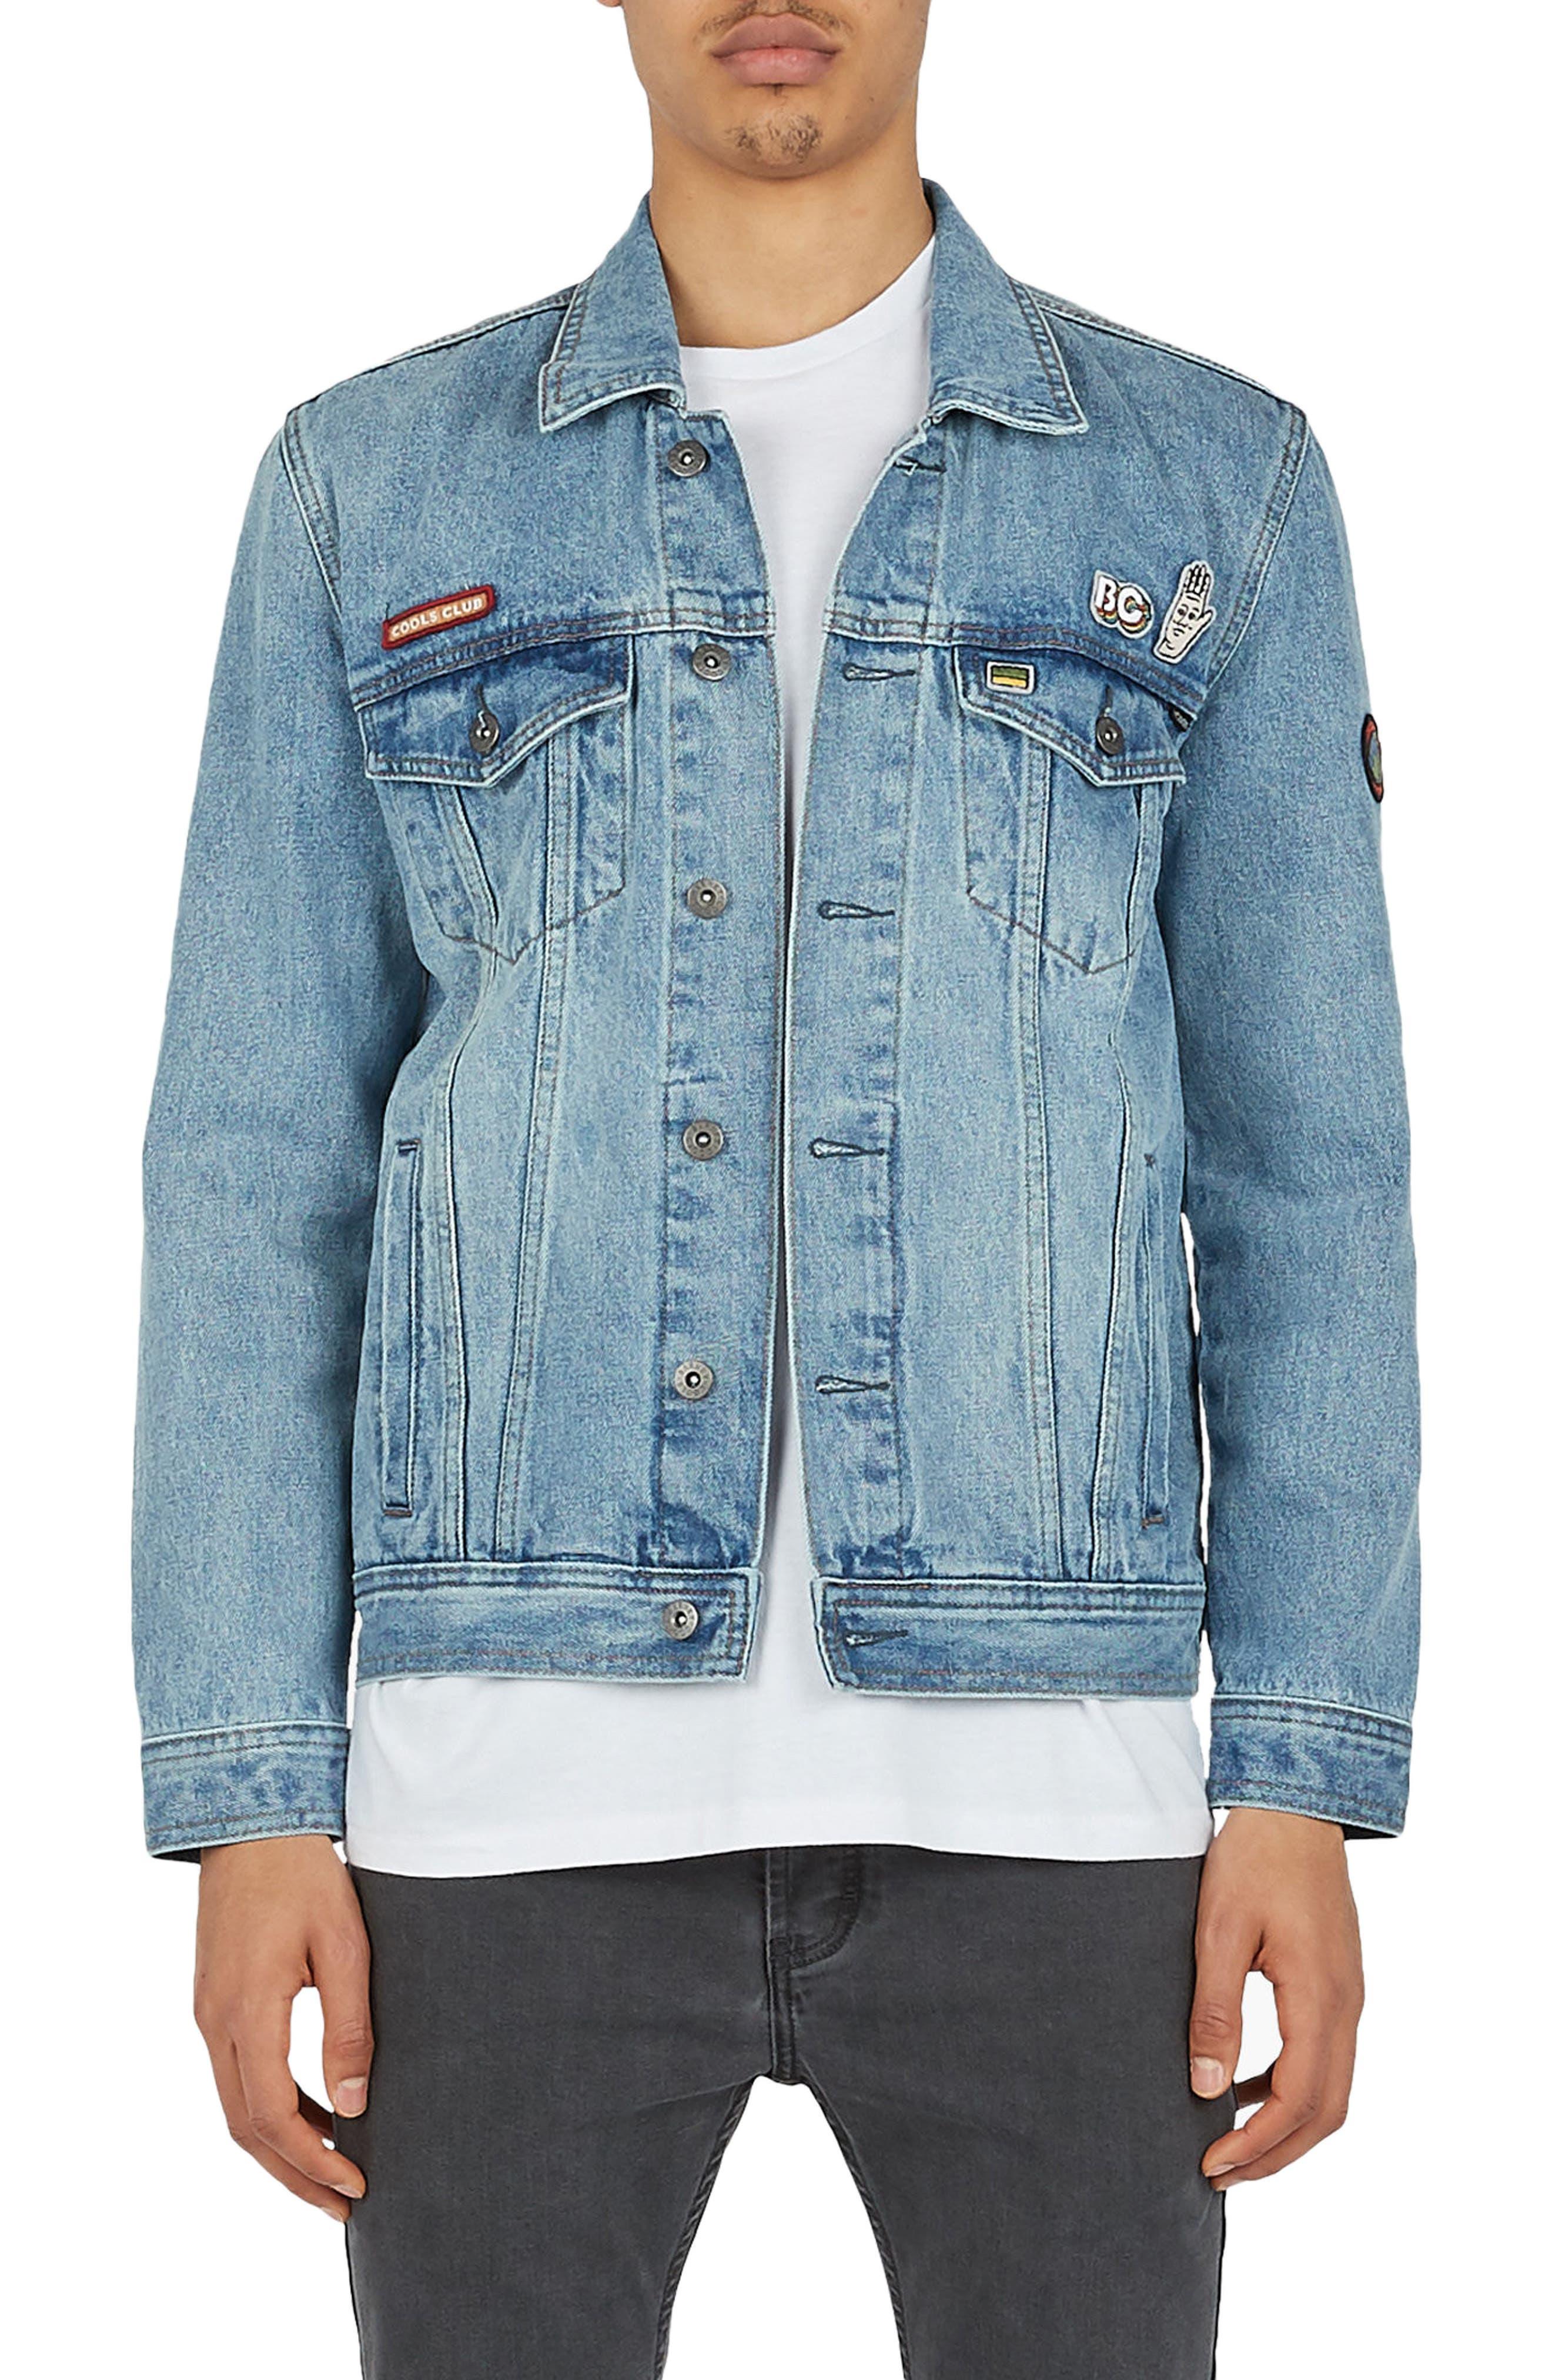 B. Rigid Denim Jacket,                             Main thumbnail 1, color,                             425